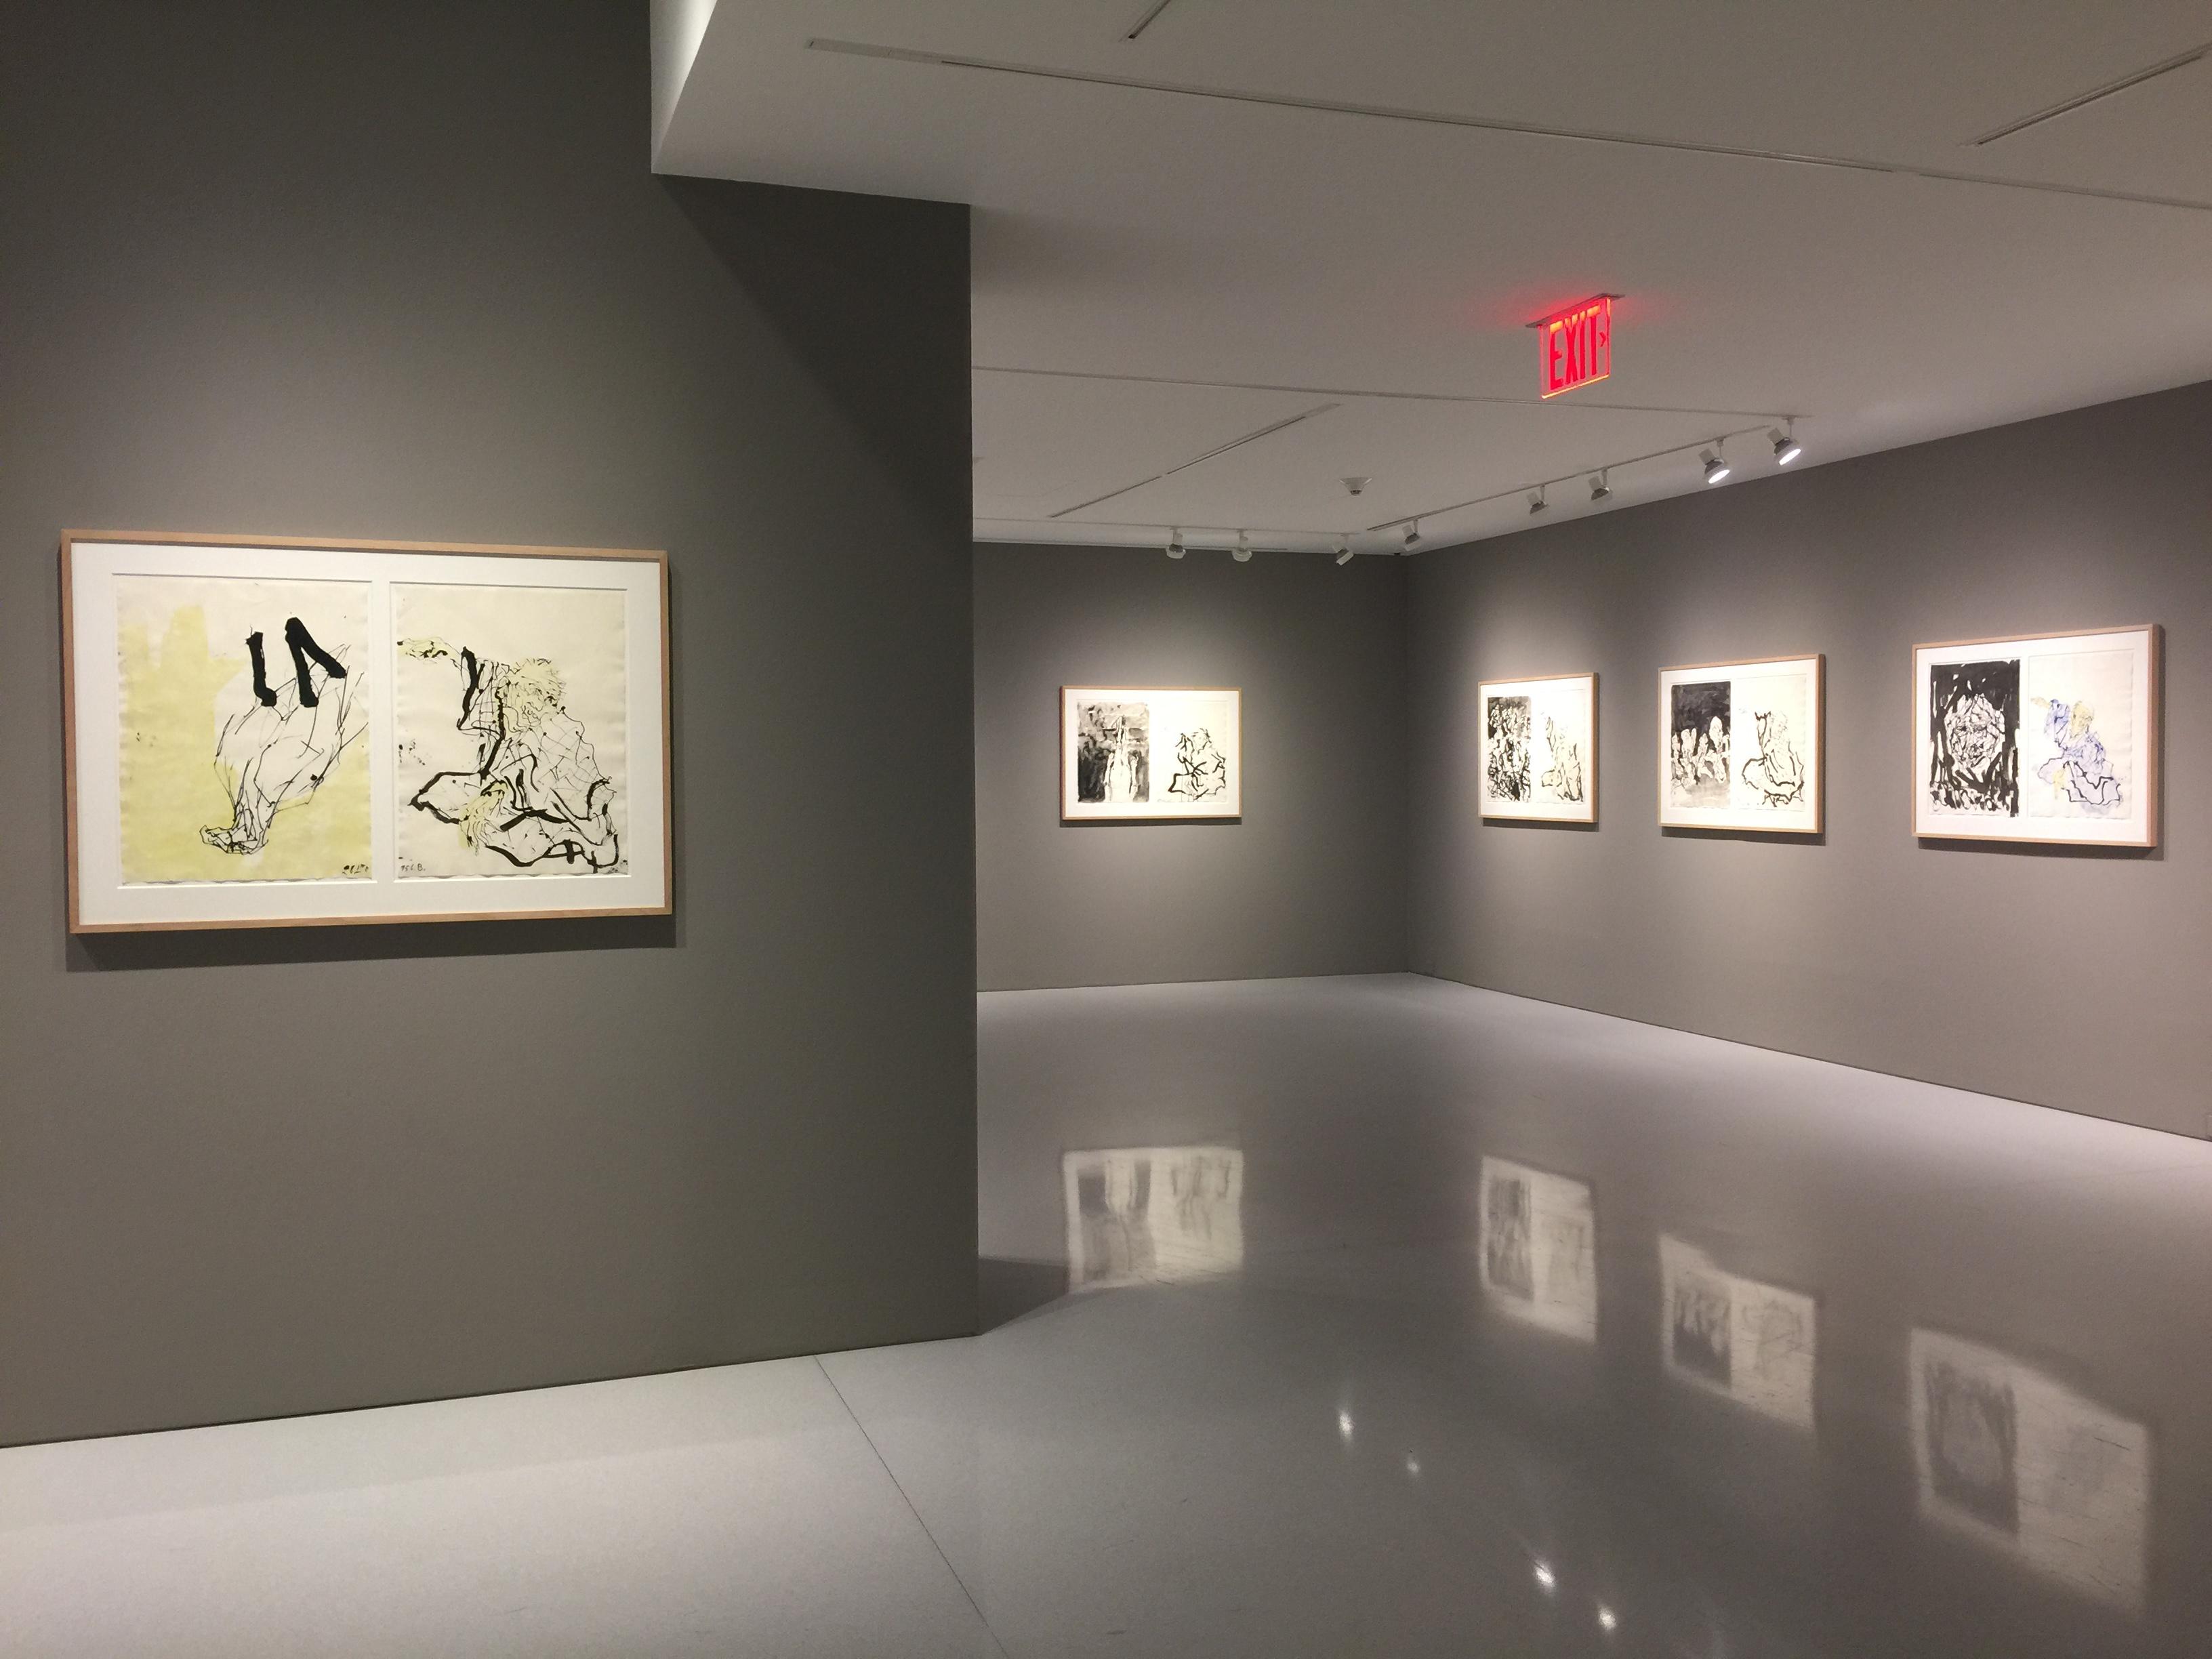 Inspirational Georg Baselitz Visit from Hokuskai Installation View via Art Observed